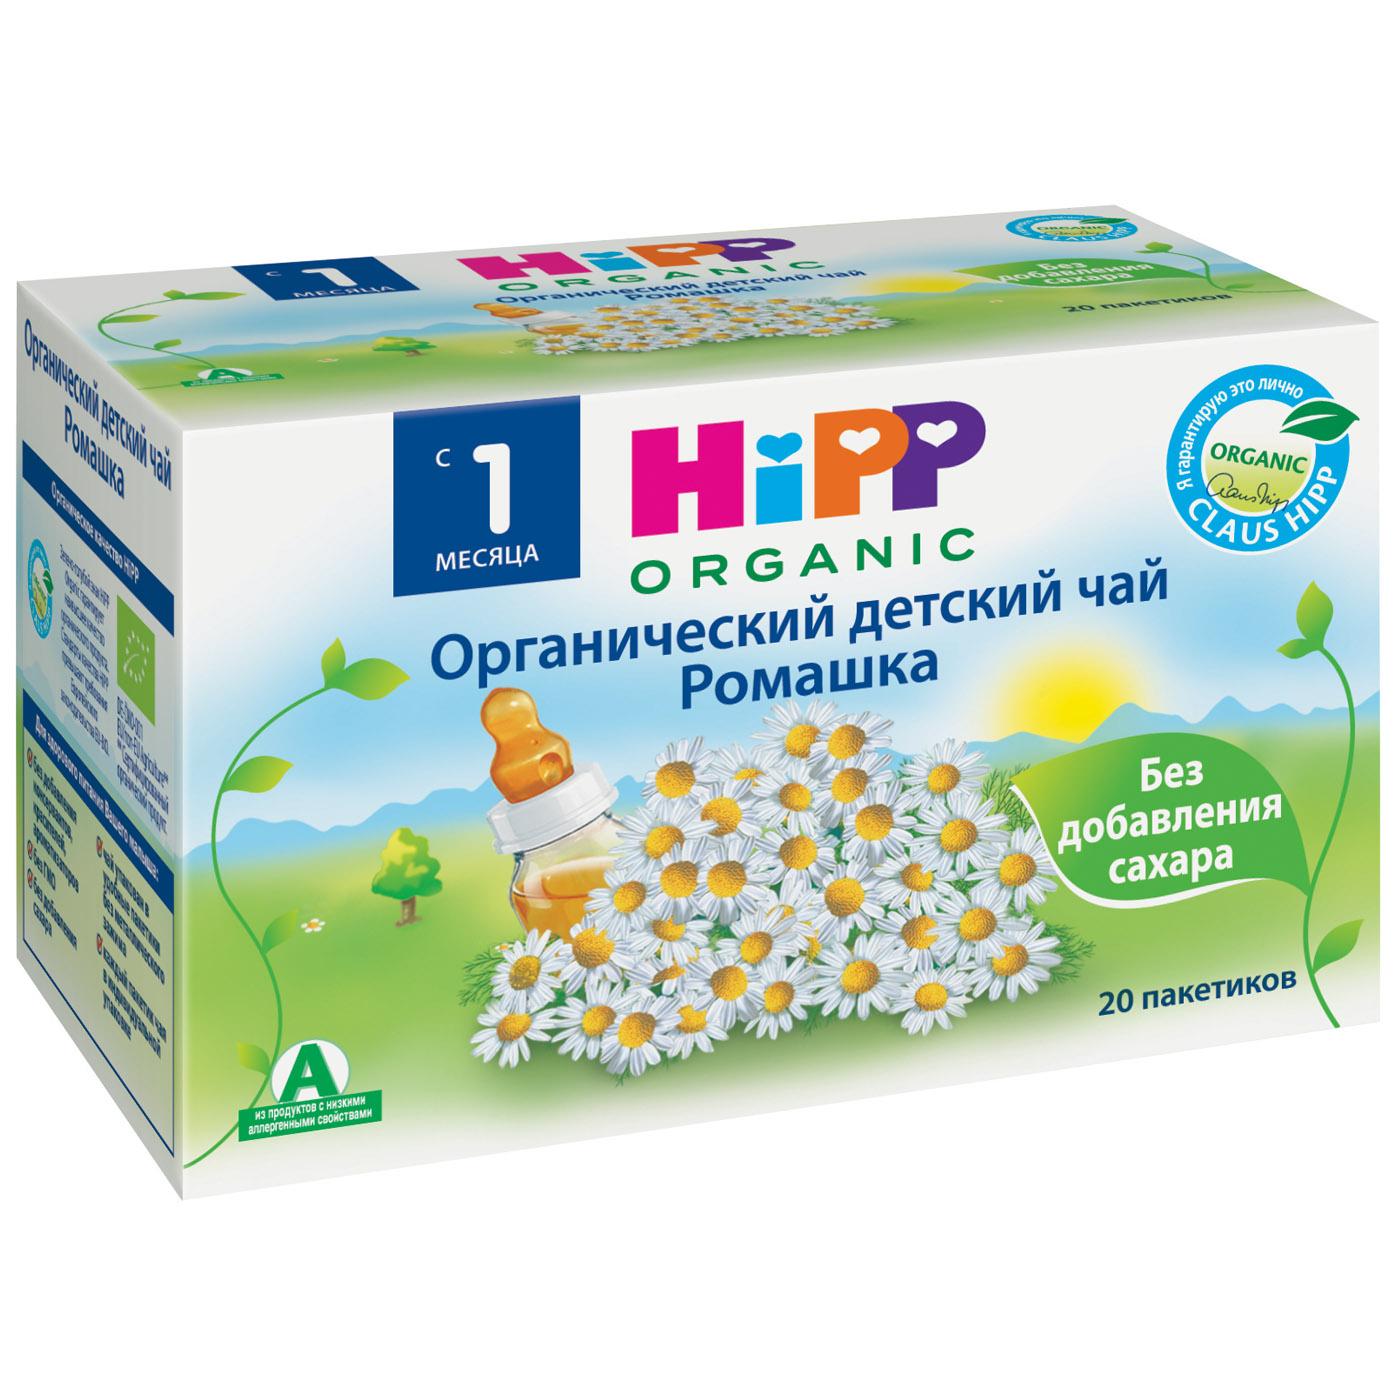 ��� ������� Hipp ������������ 30 �� (20 ���������) ������� (� 1 ���)